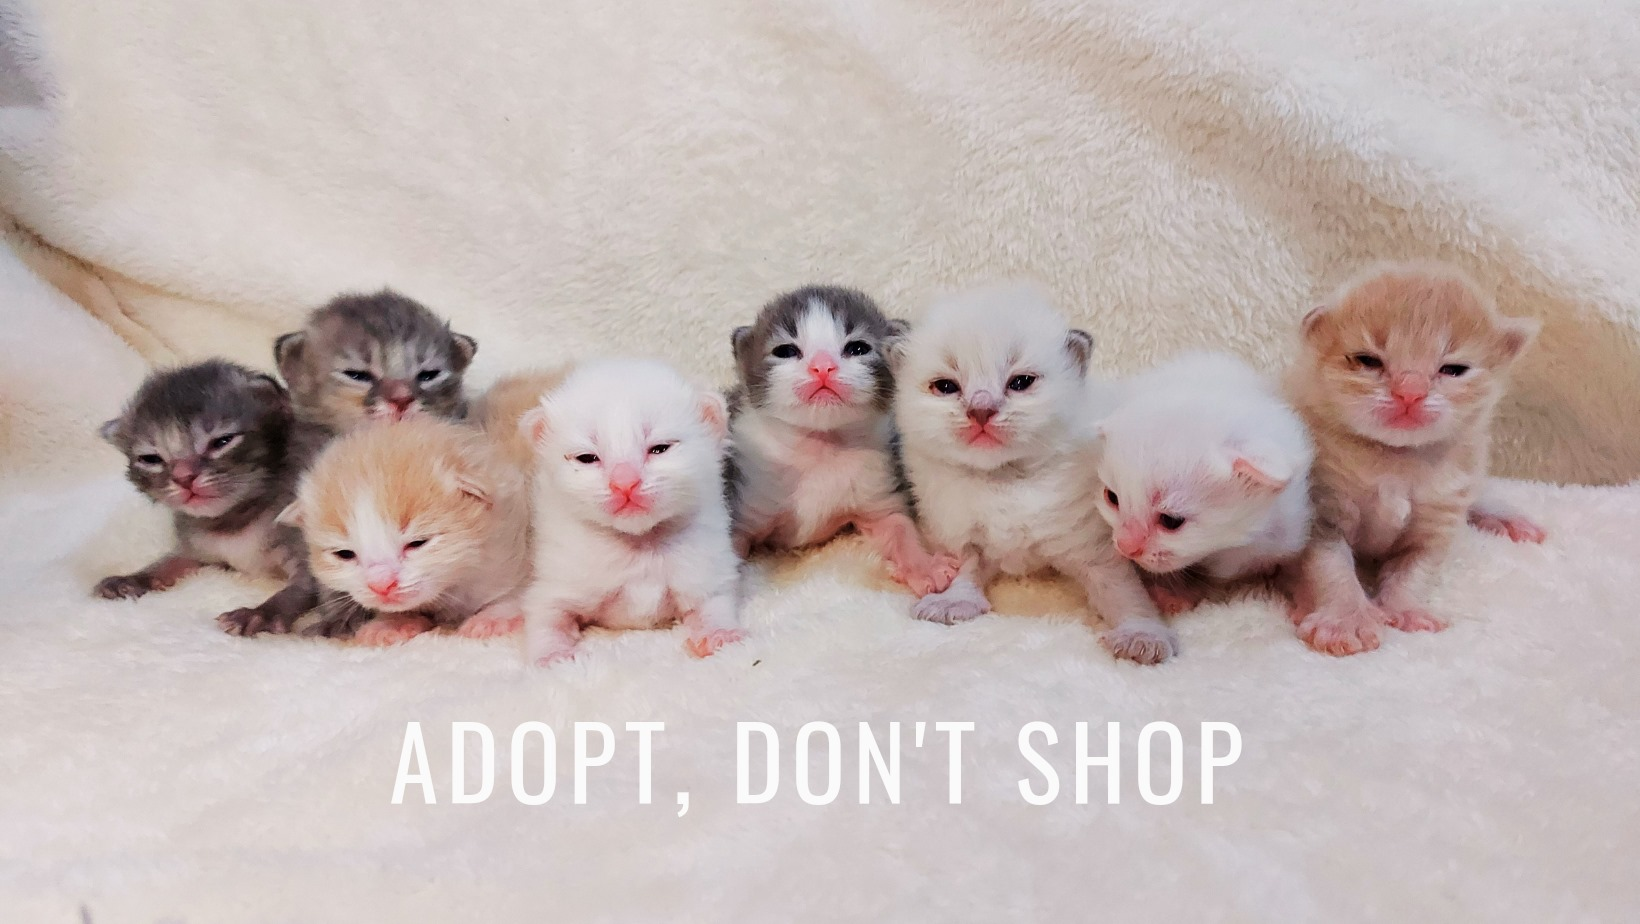 newborn kittens in Adopt Don't Shop banner